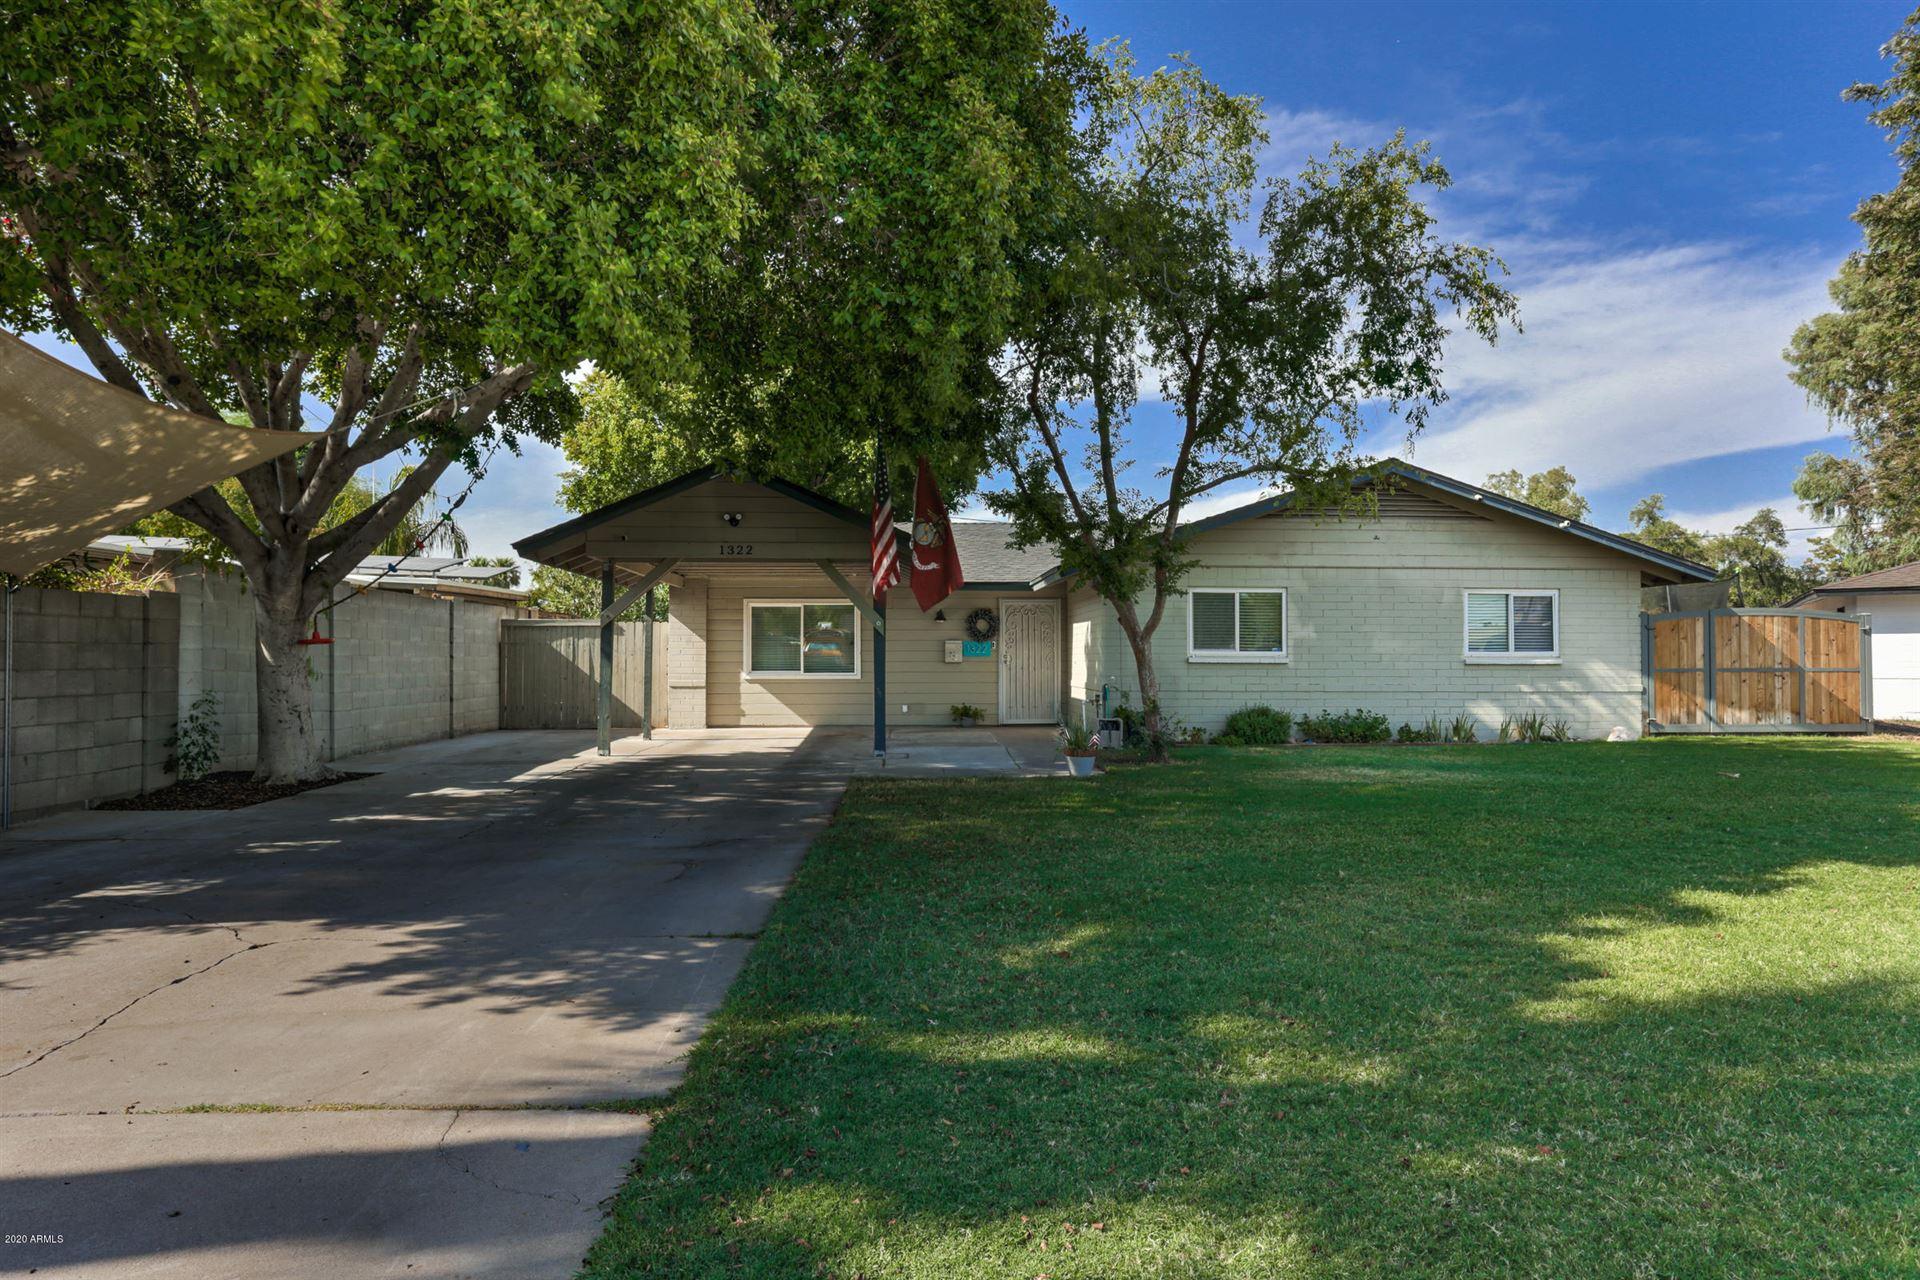 1322 E CATALINA Drive, Phoenix, AZ 85014 - #: 6117680